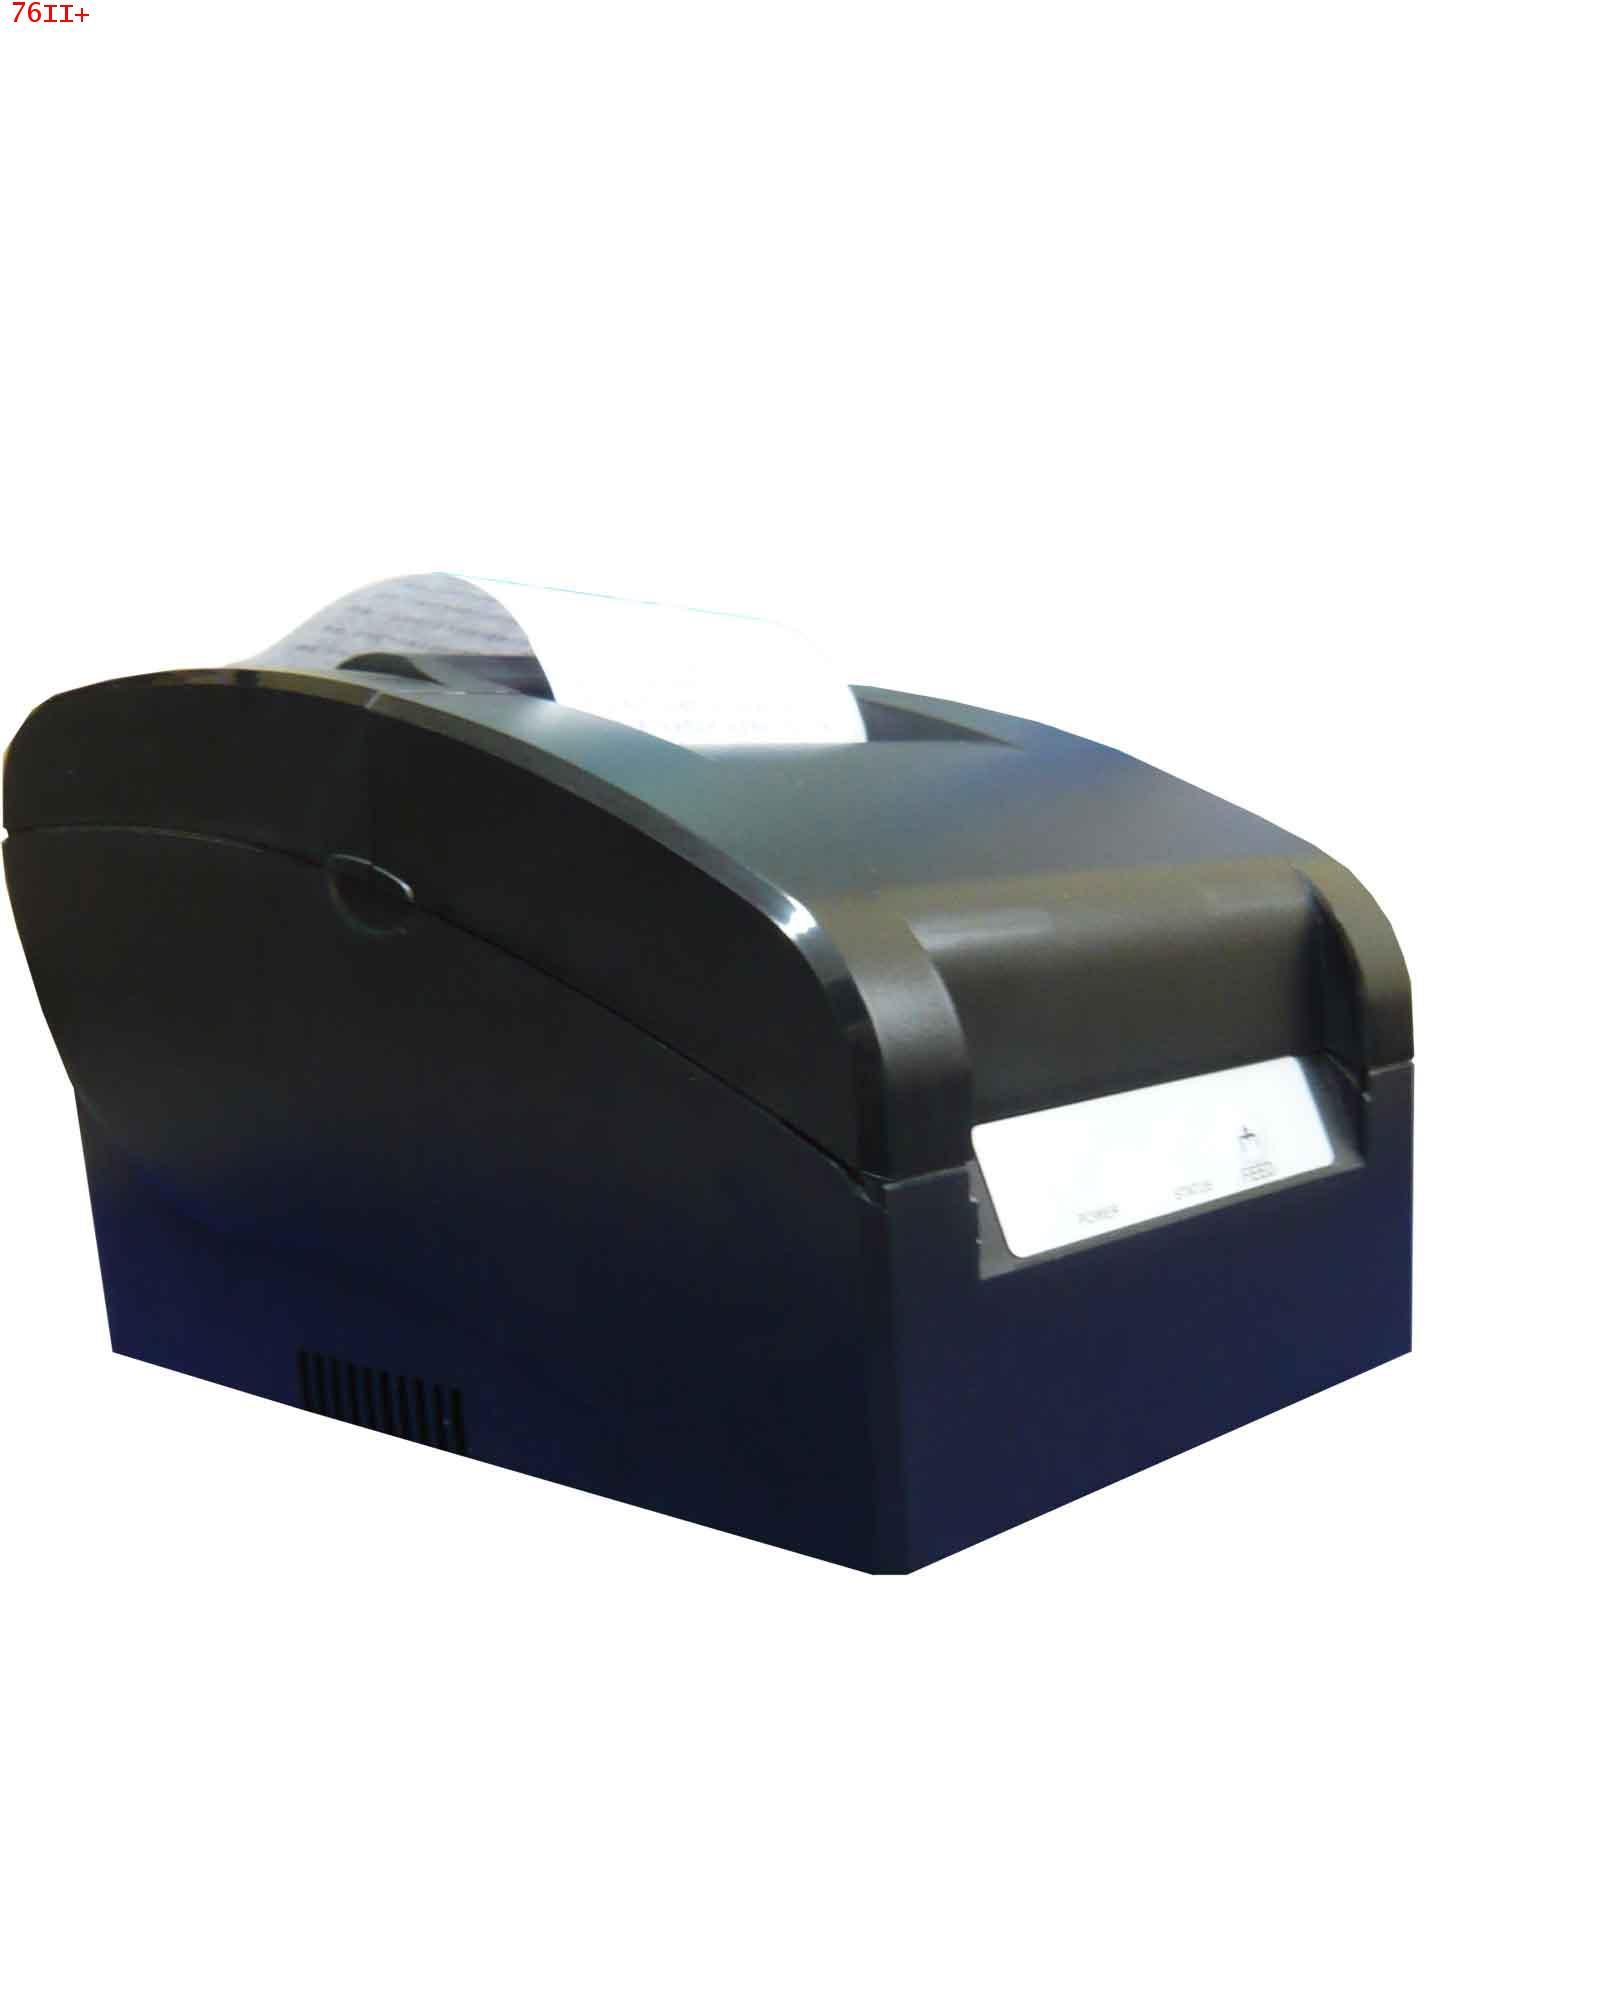 dot matrix printer 76II+